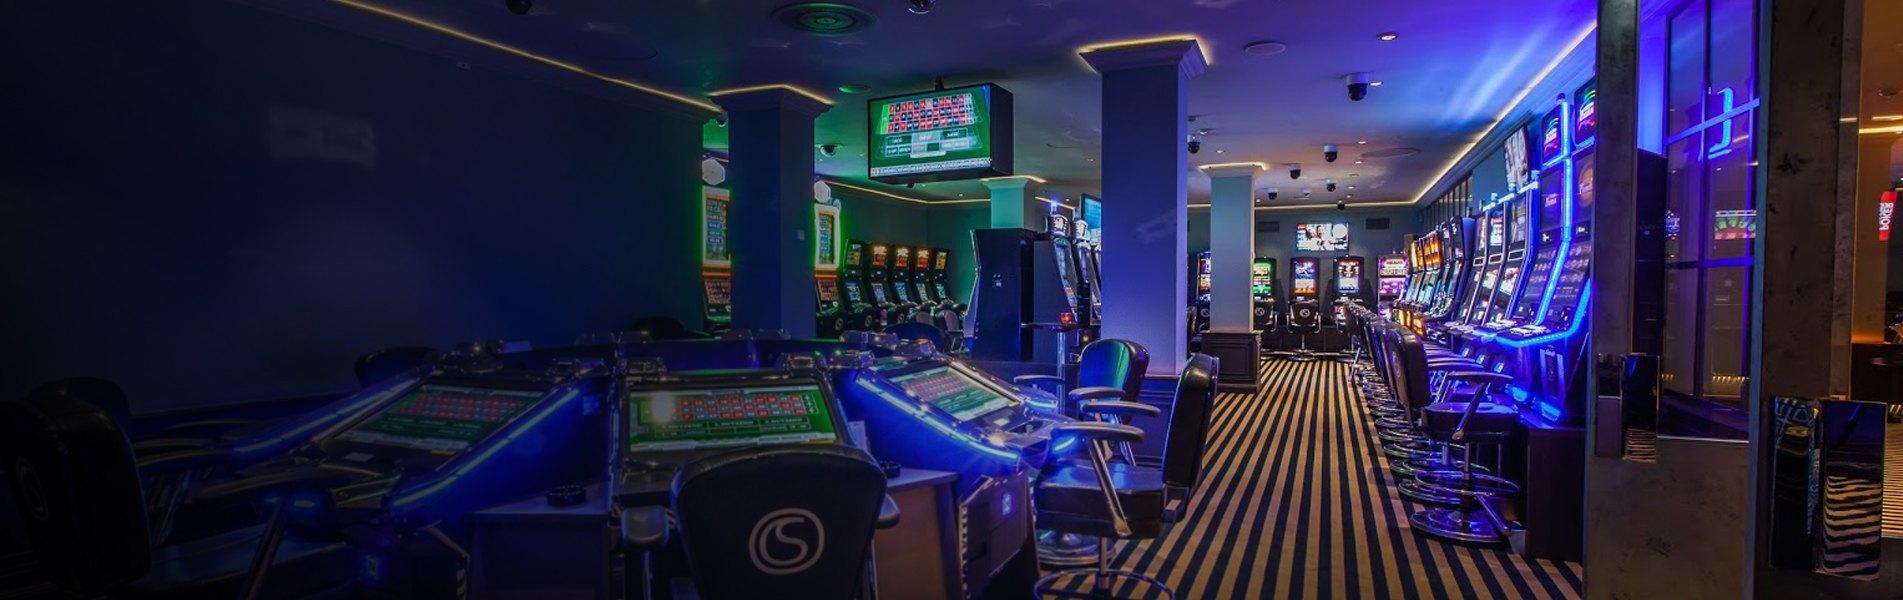 Staatliche Spielbanken 598519